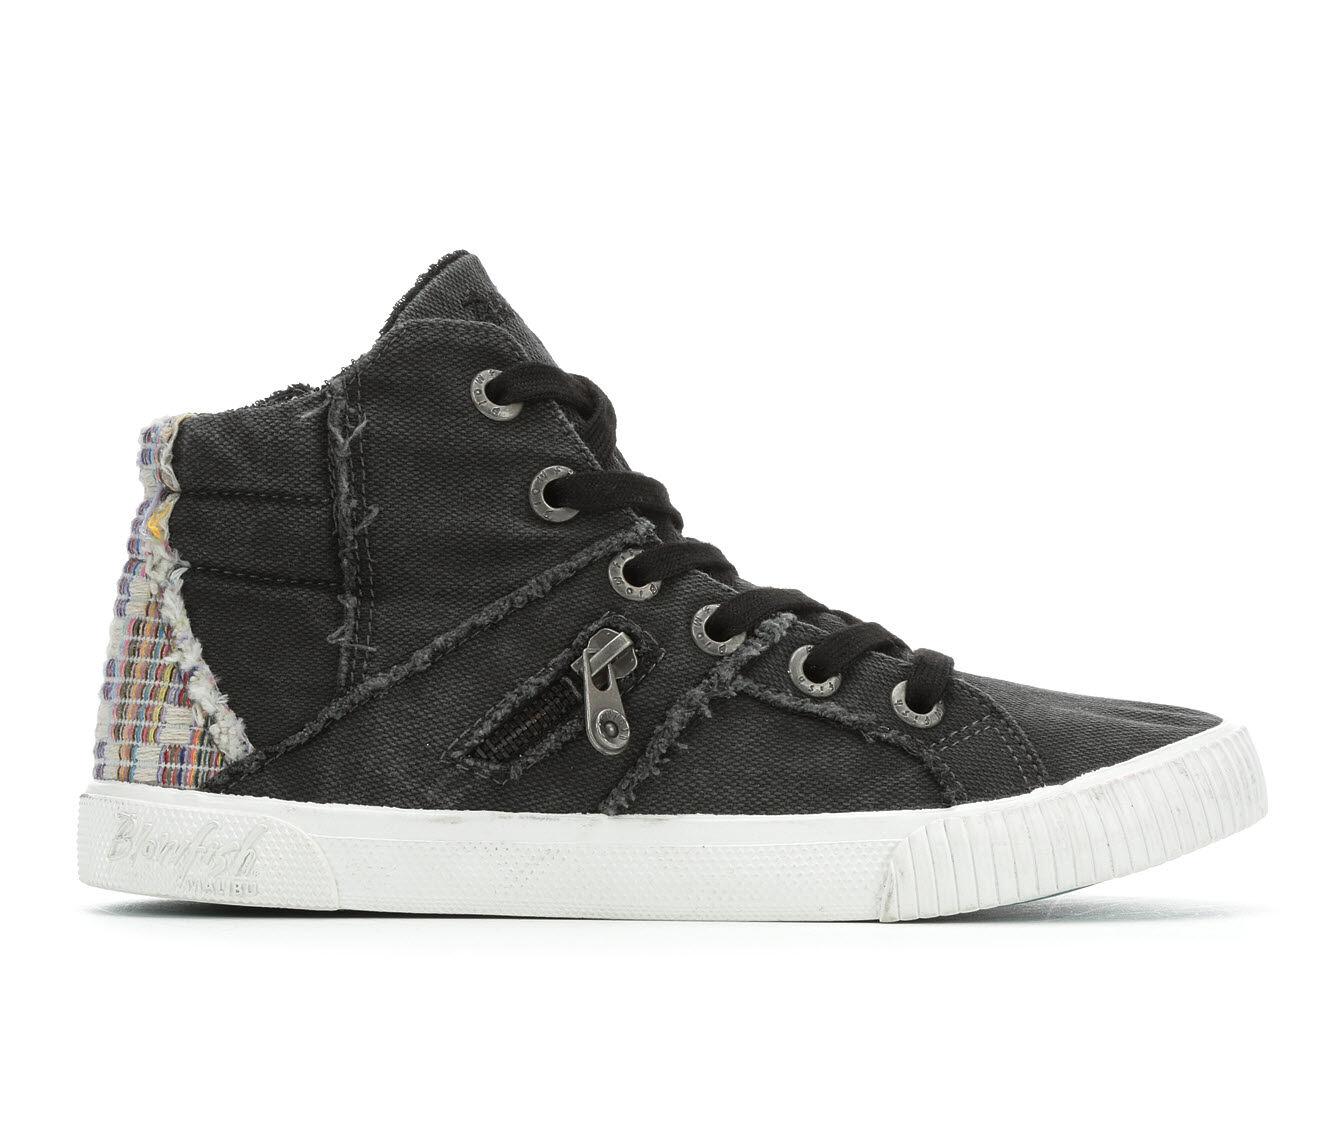 Women's Blowfish Malibu Fruitcake Sneakers Black